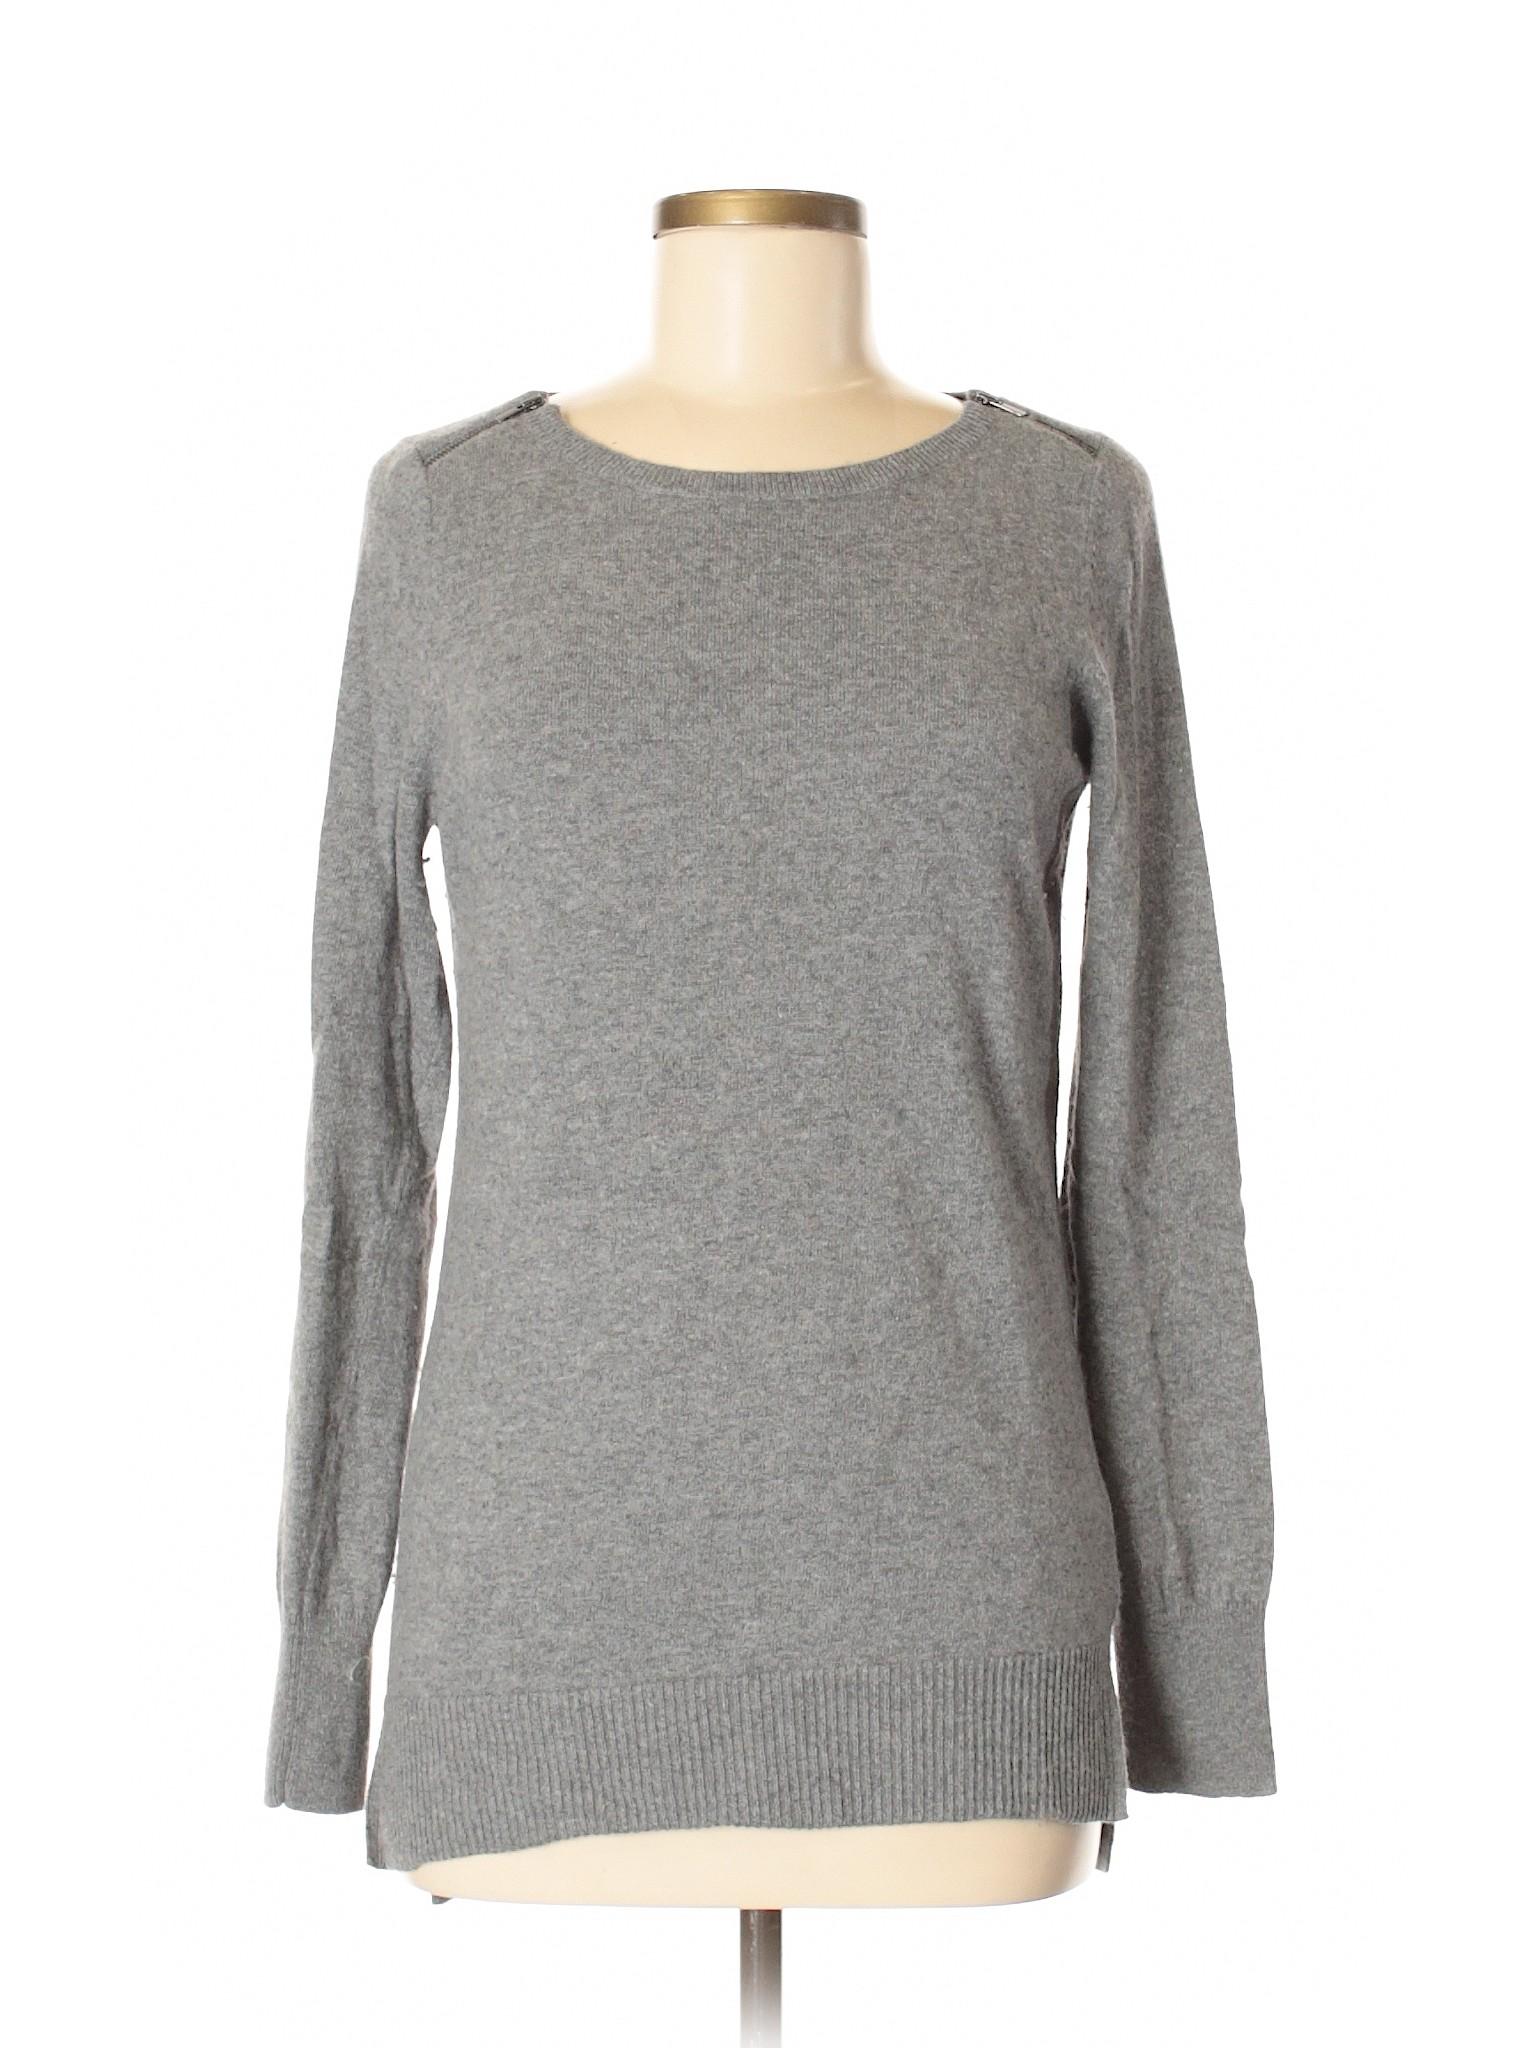 Pullover Sweater Banana Republic winter Boutique AnUO7tqwx